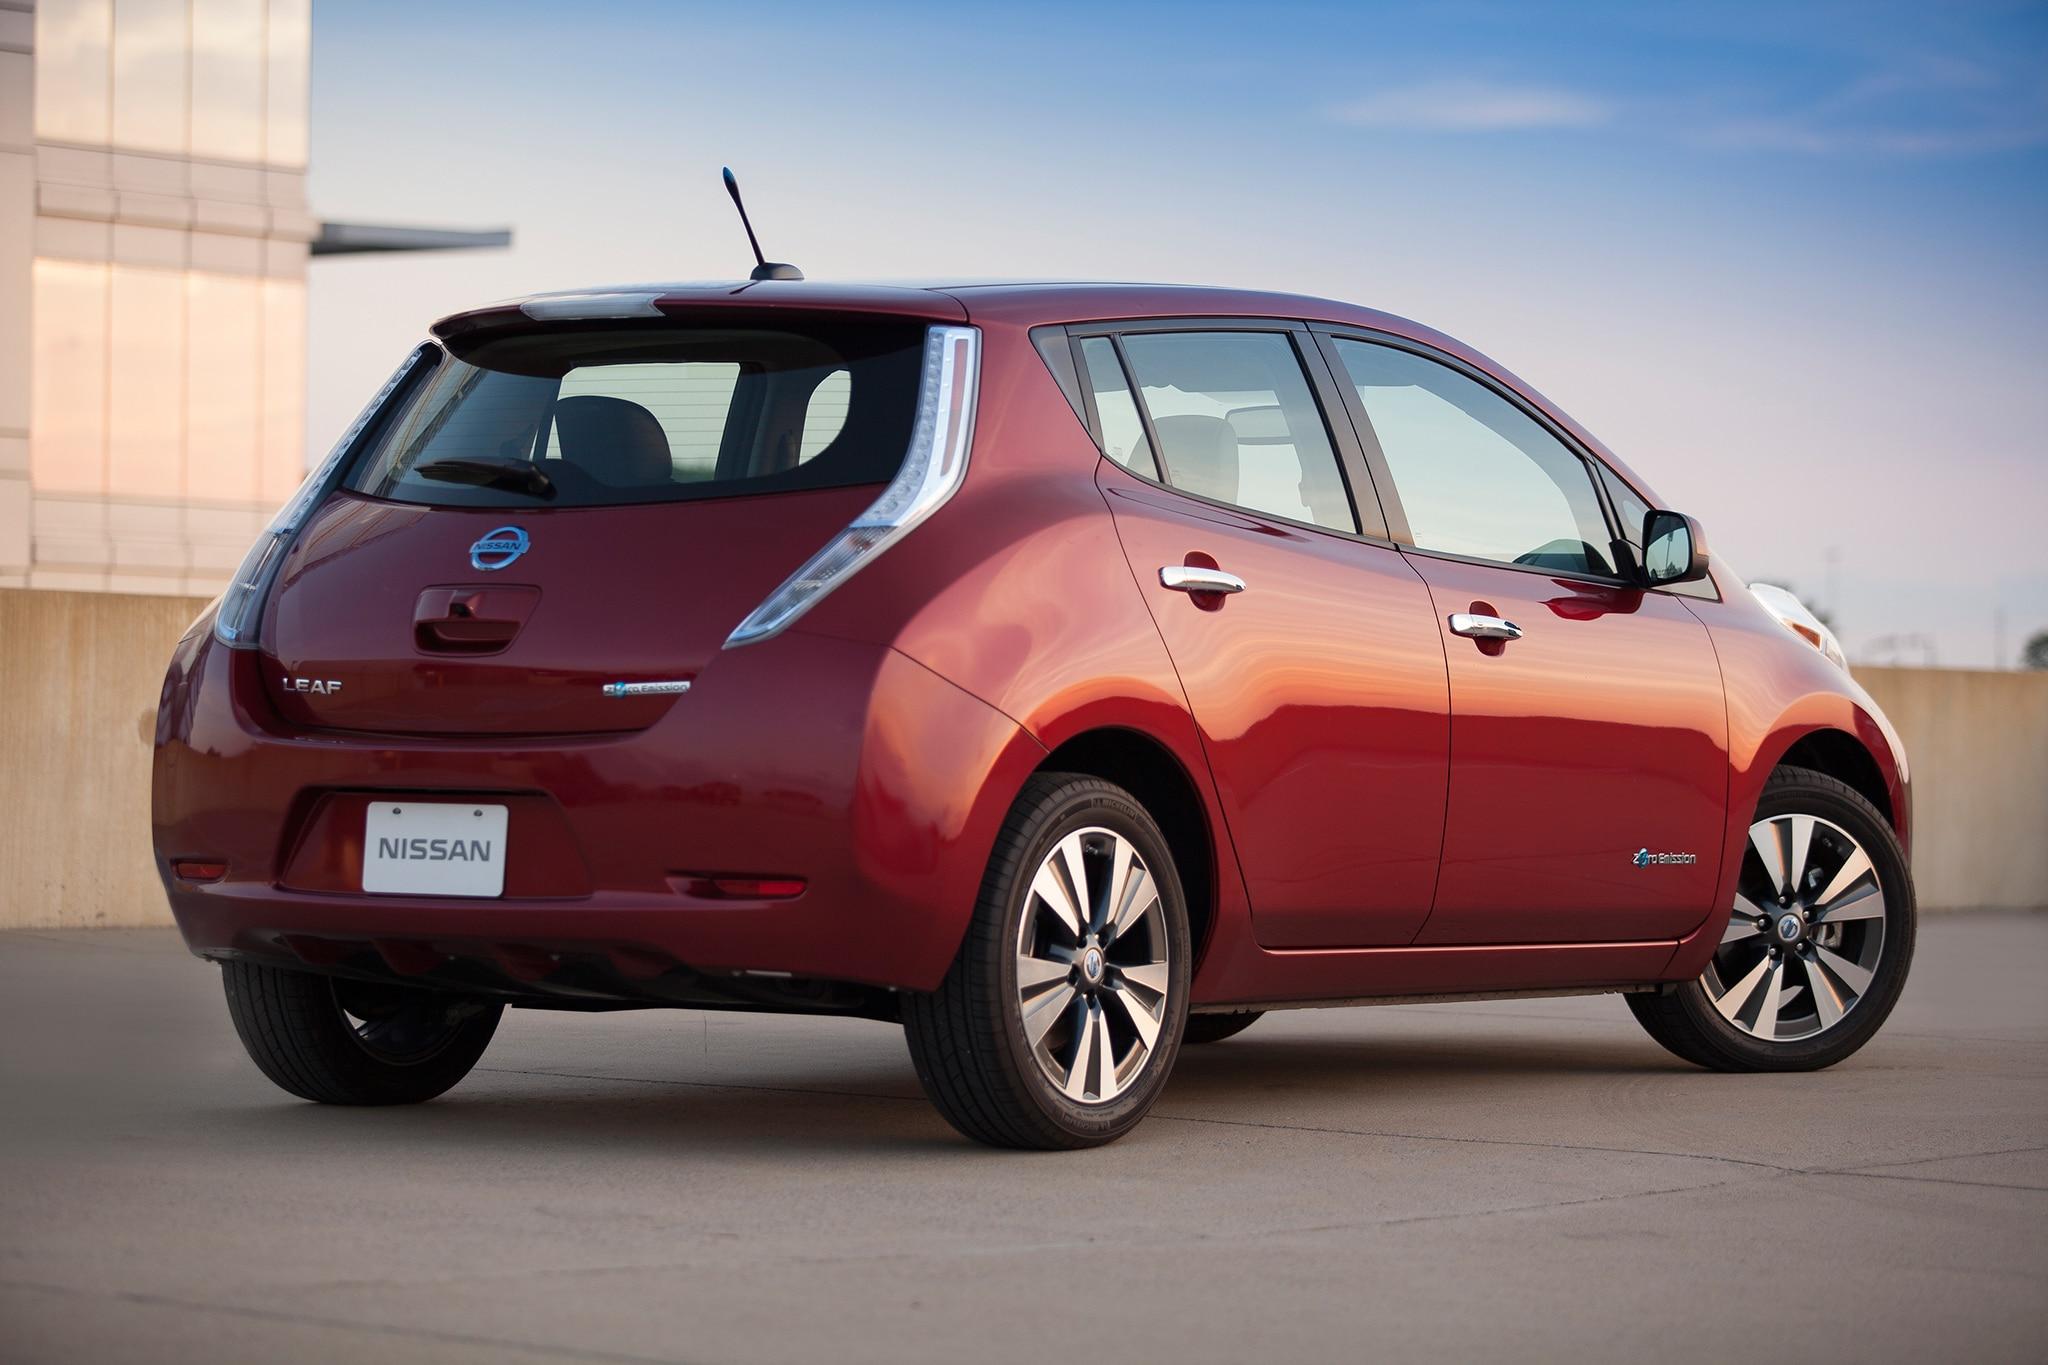 Nissan Leaf 60 Kwh Battery >> 2016 Nissan Leaf SL One Week Review | Automobile Magazine